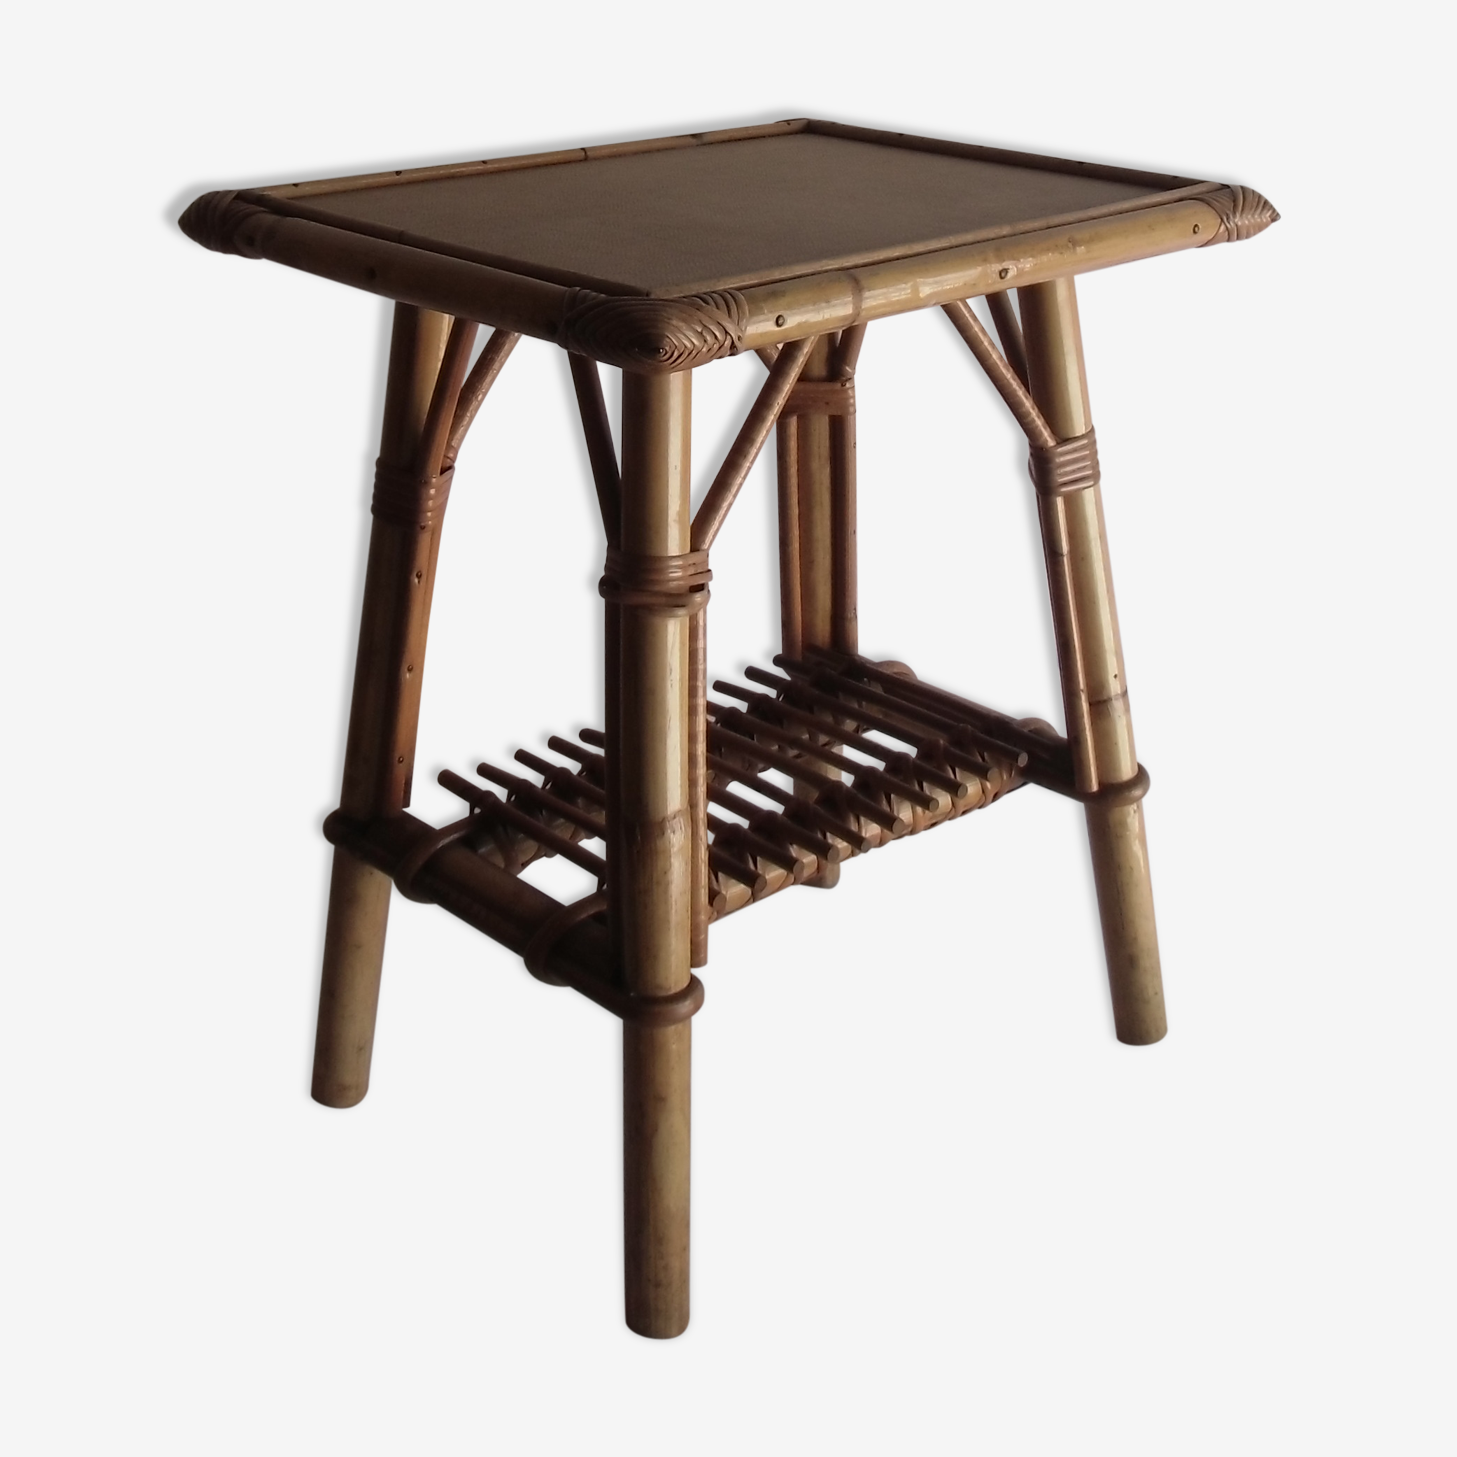 Table d'appoint - Sellette